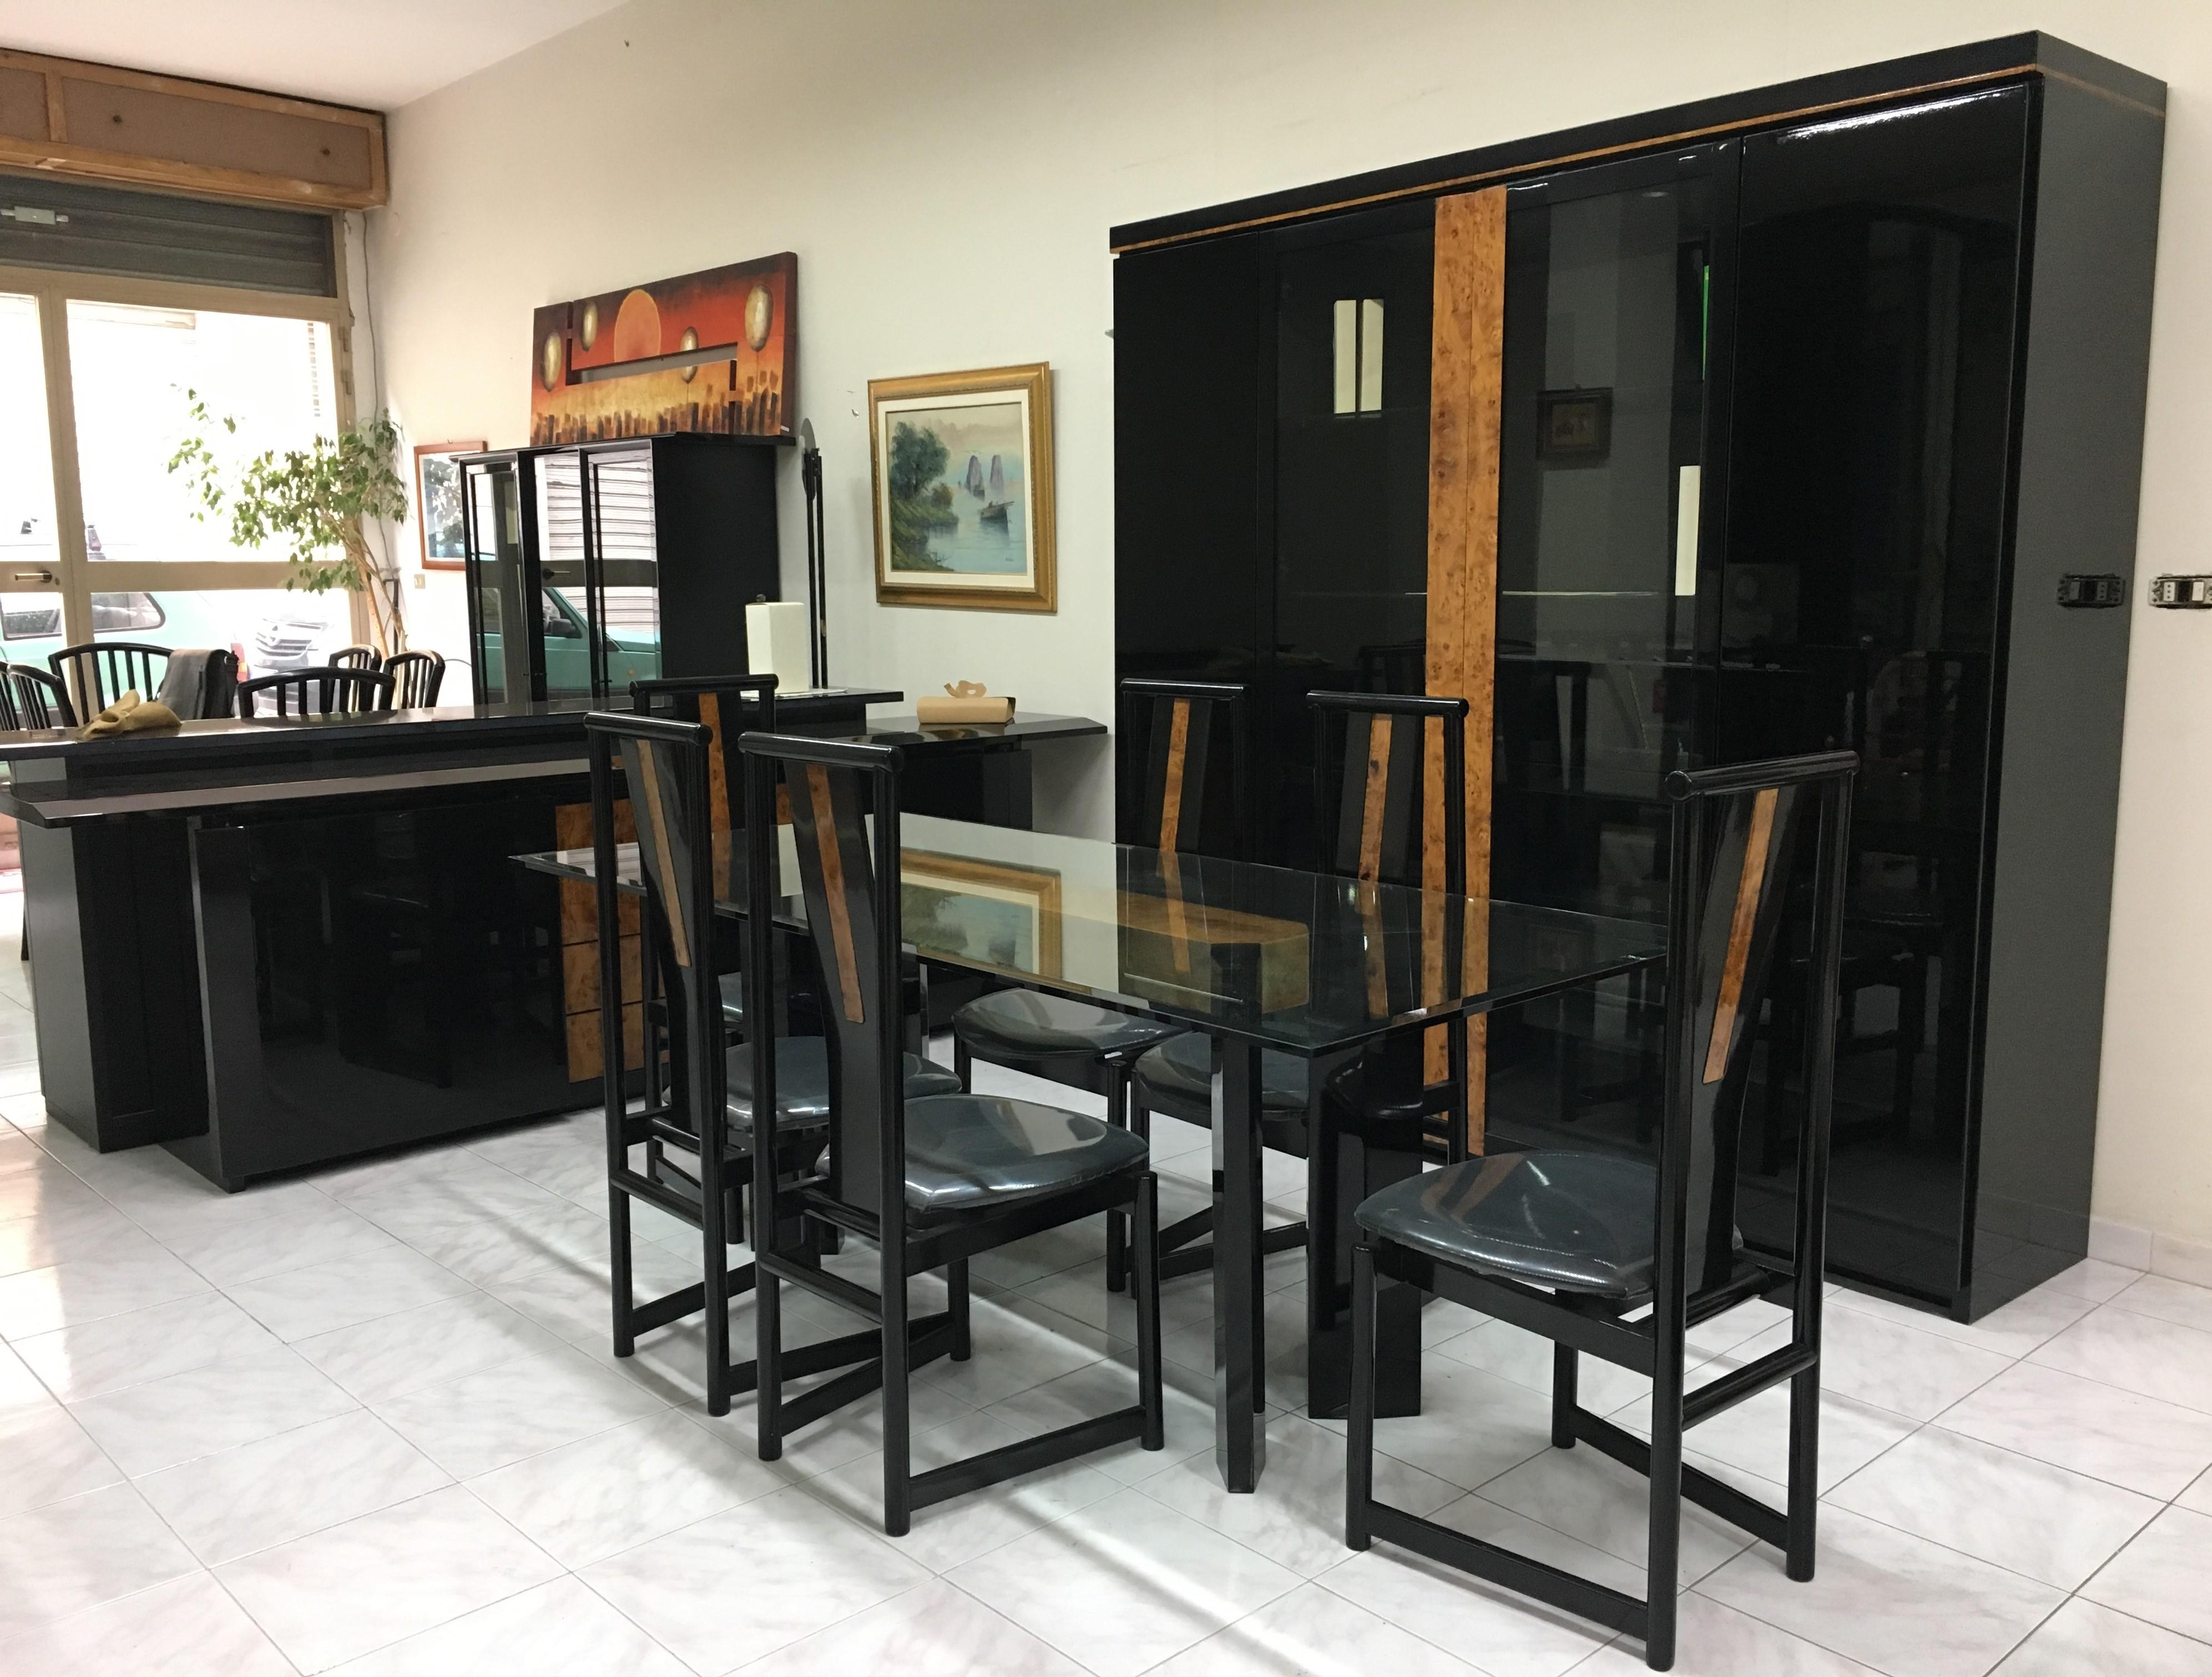 Cassettiera Cucina Sala Da Pranzo  jogja 2021